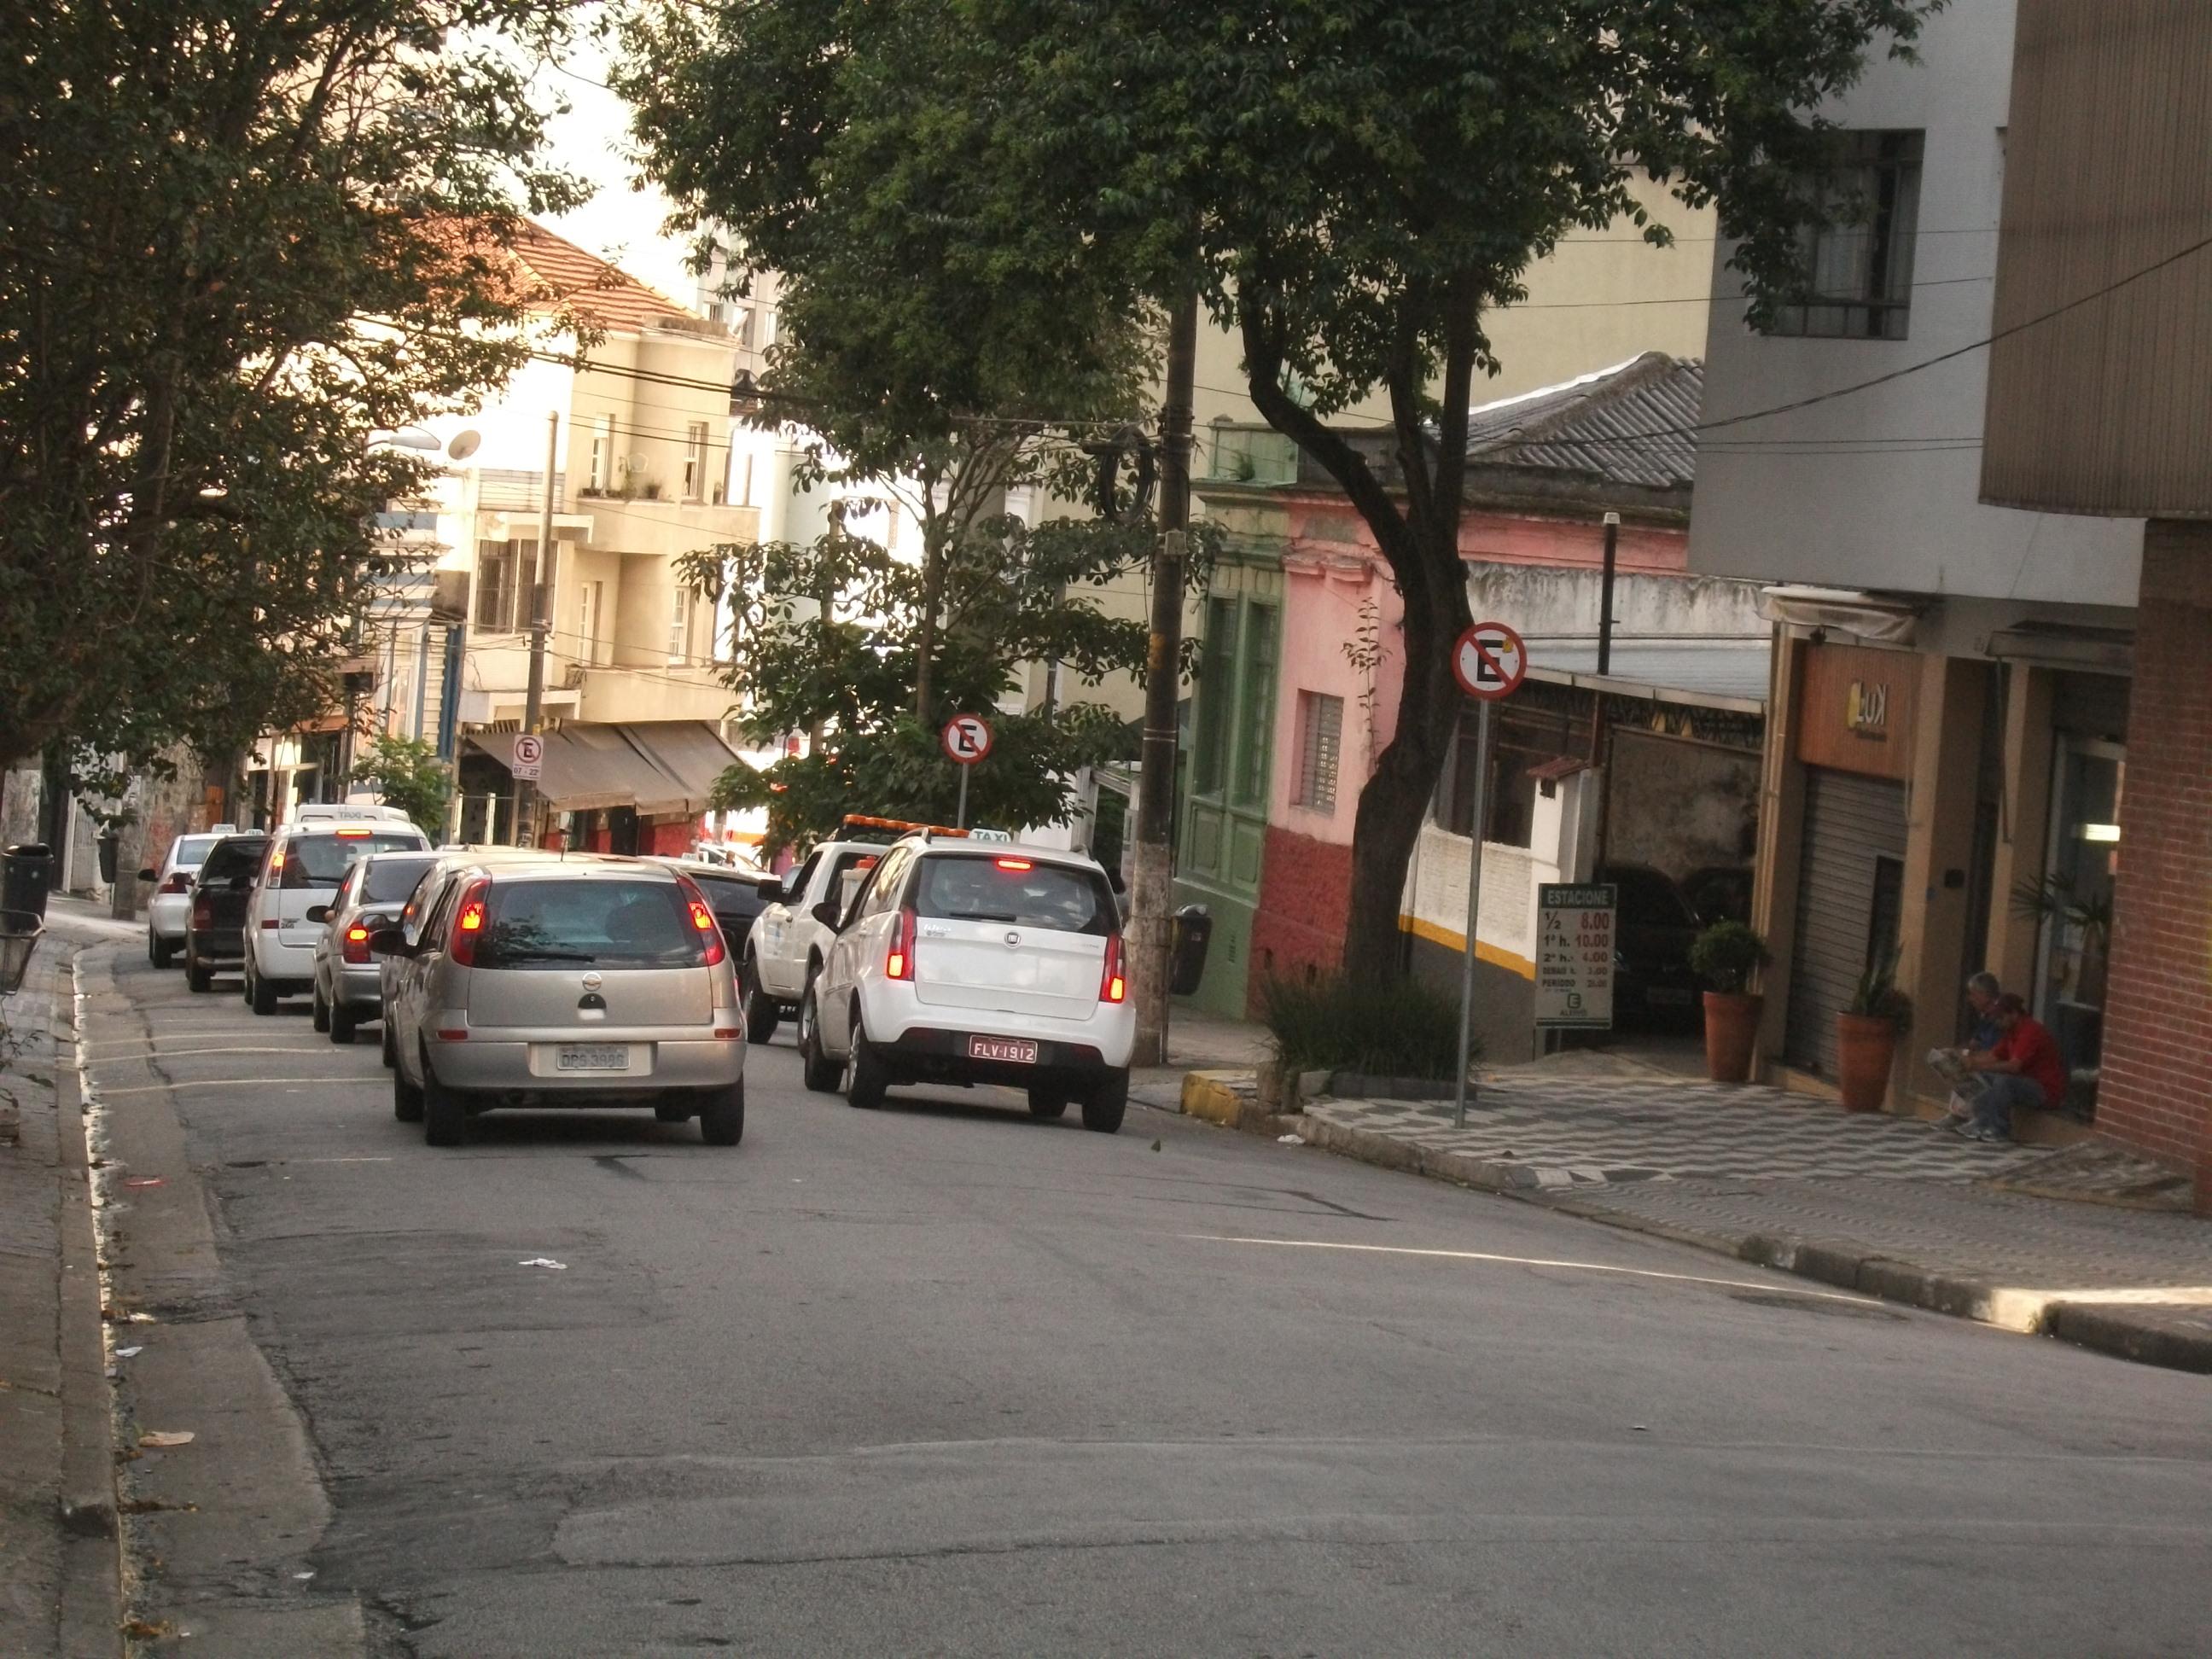 from Austin rua frei caneca gay